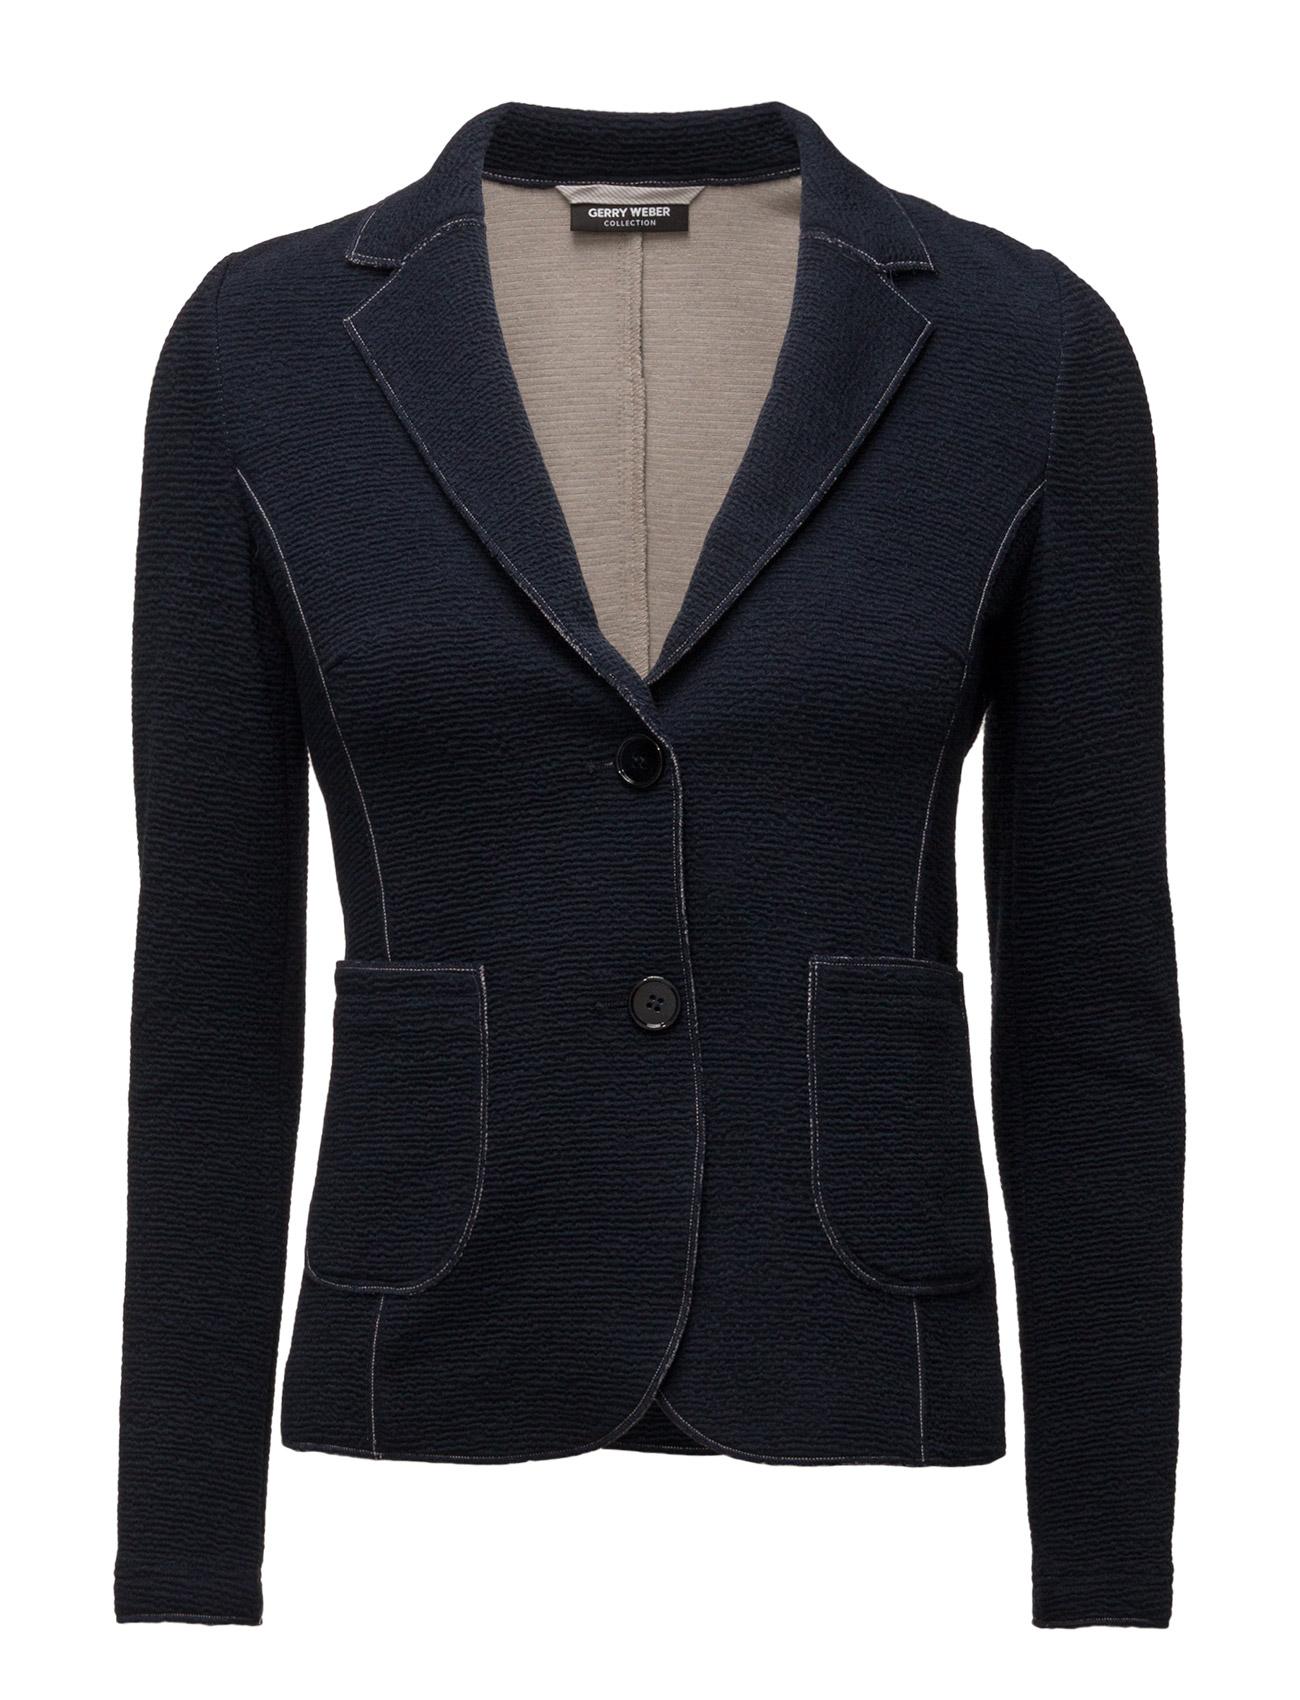 Blazer Long-Sleeve U Gerry Weber Blazere til Kvinder i indigo